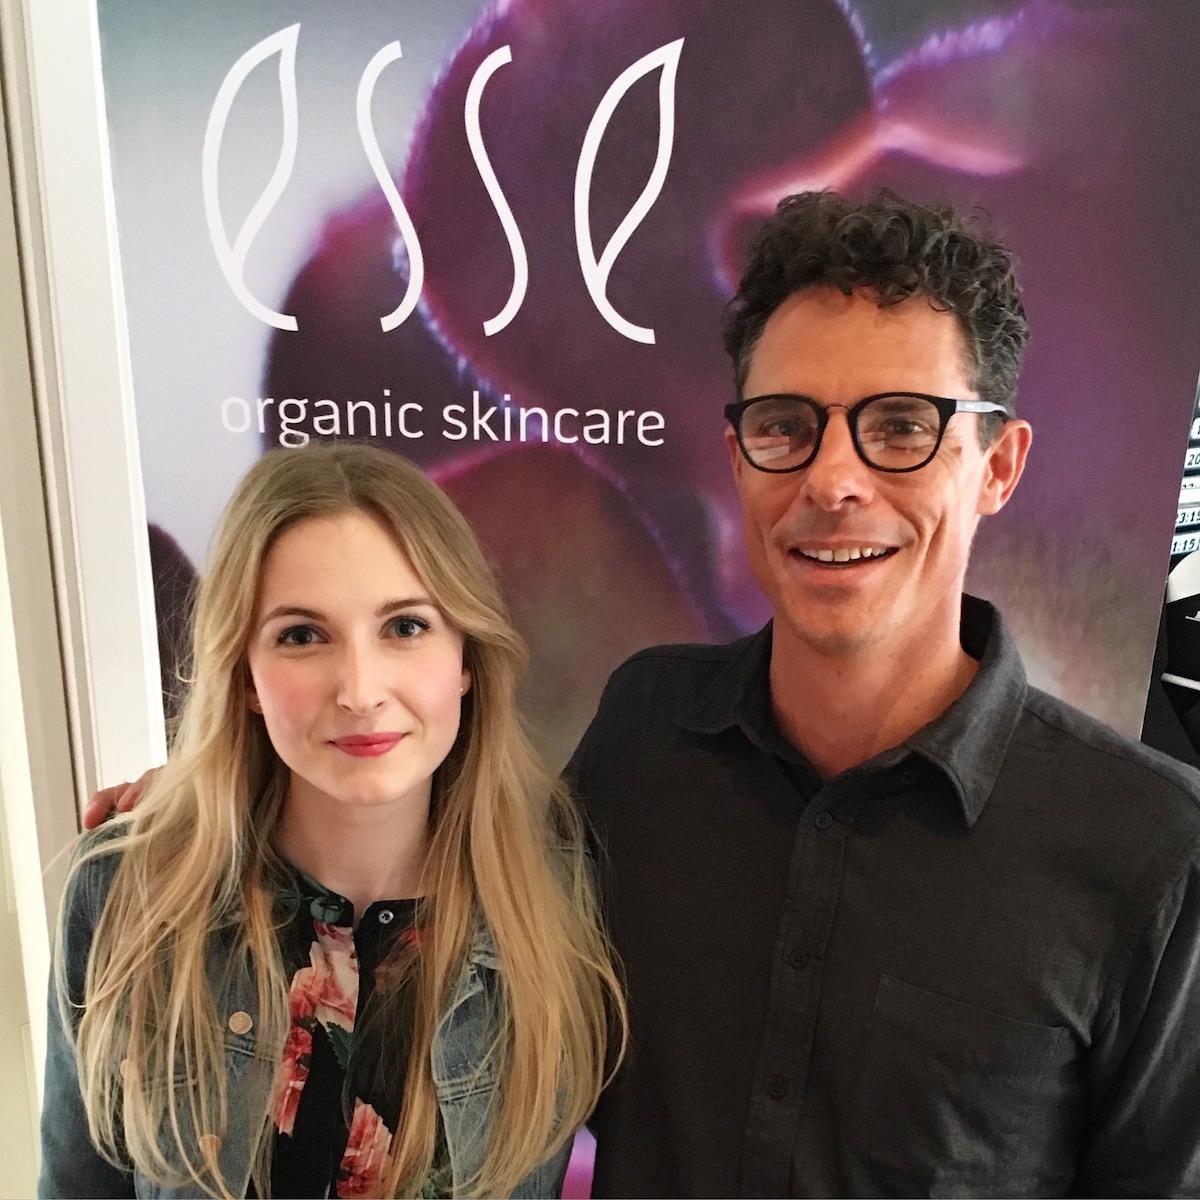 Esse Probiotic Skincare Andrea Olofsson and Trevor Steyn |skonhetssnack.se